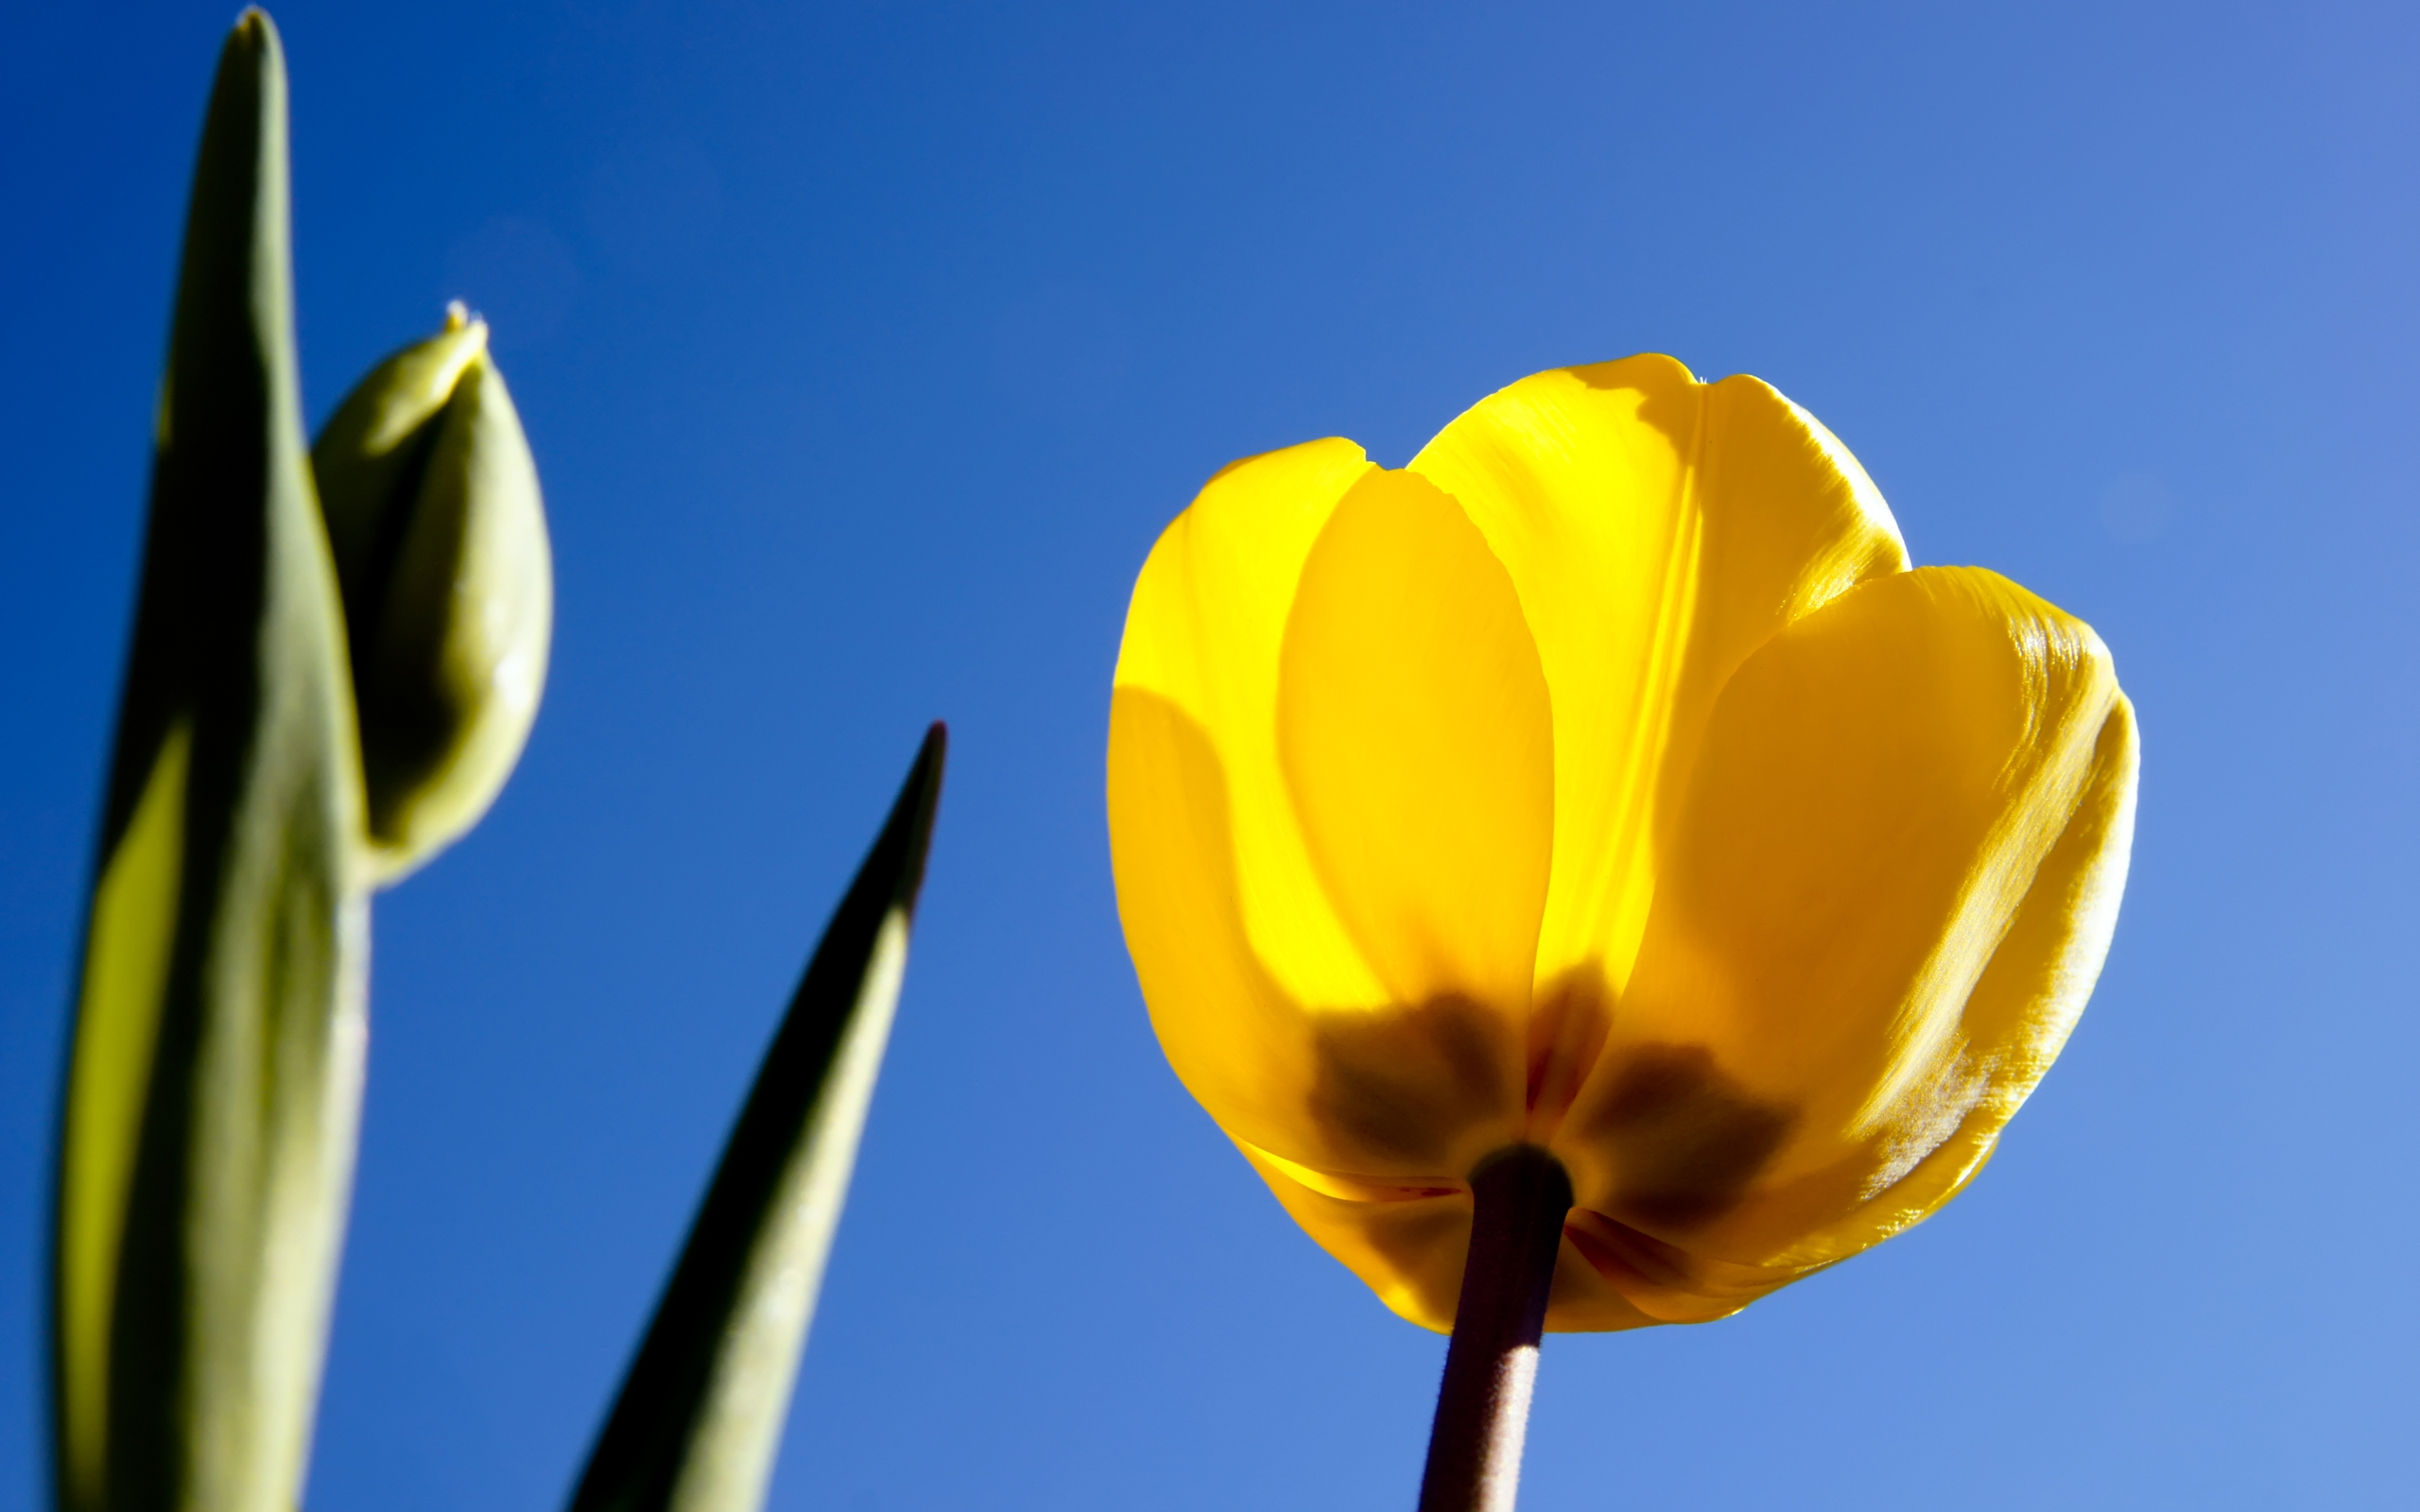 природа цветы тюльпаны желтые nature flowers tulips yellow загрузить